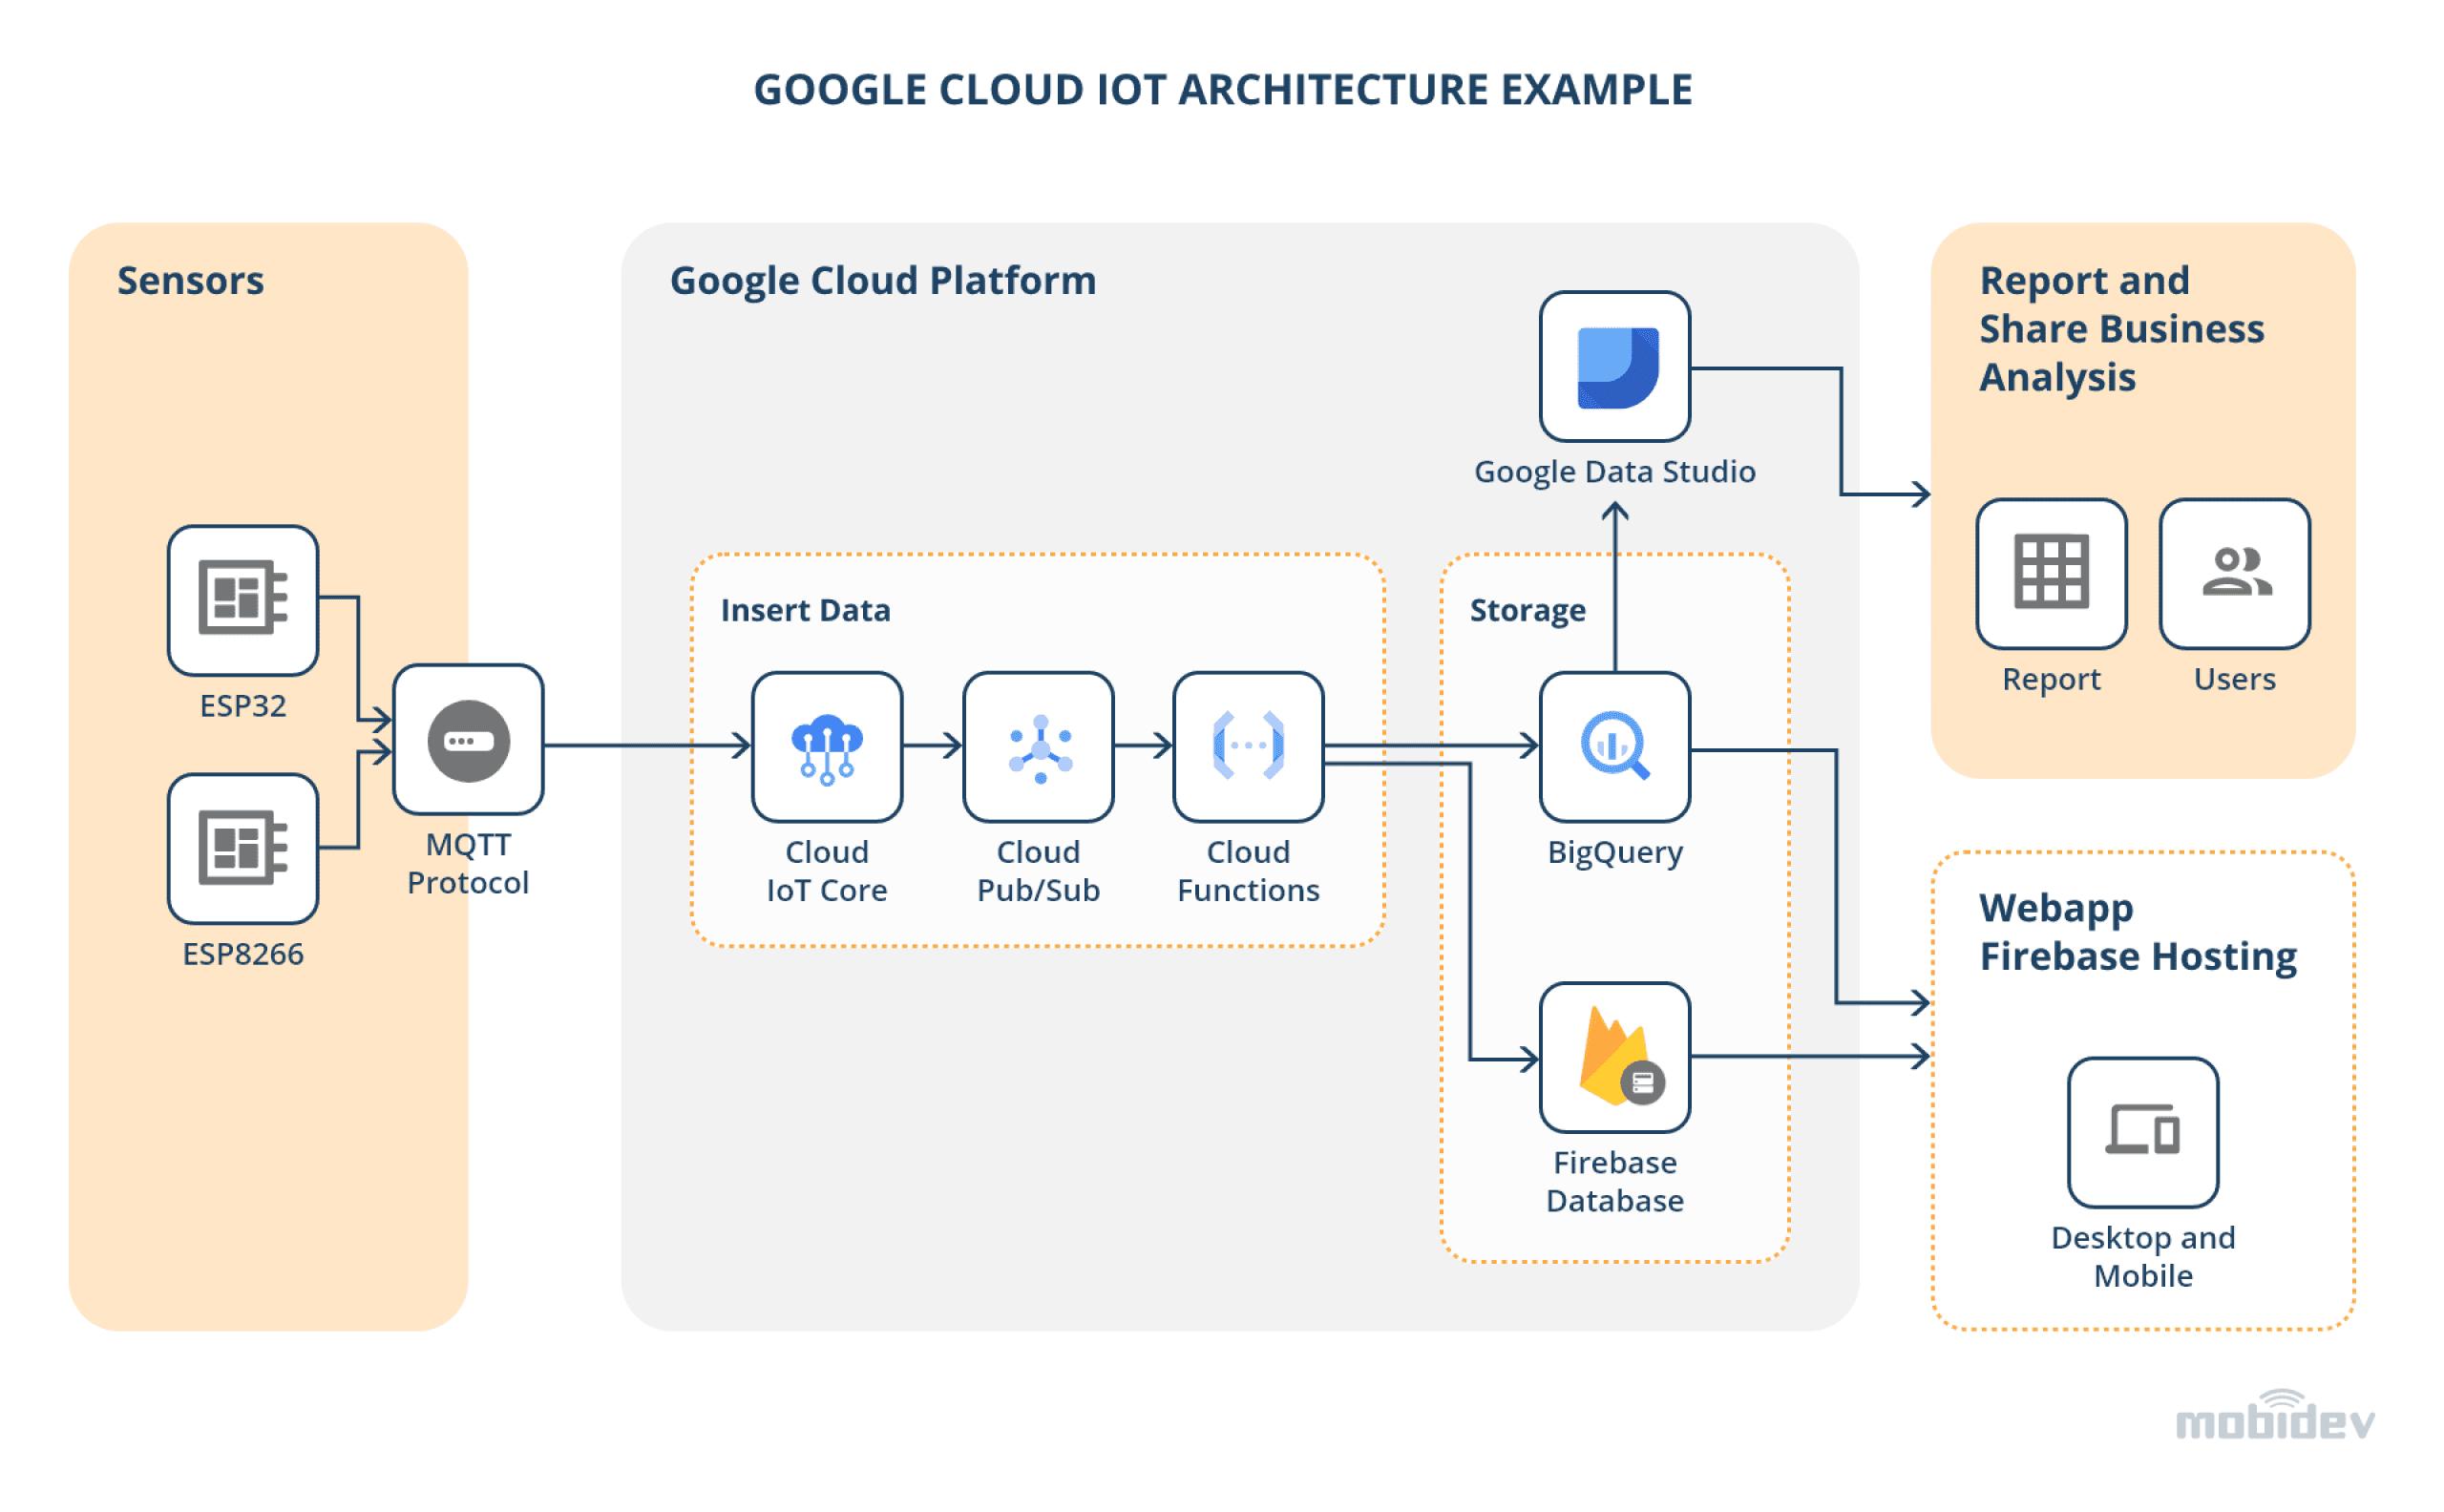 Google Cloud IoT Architecture example@4x